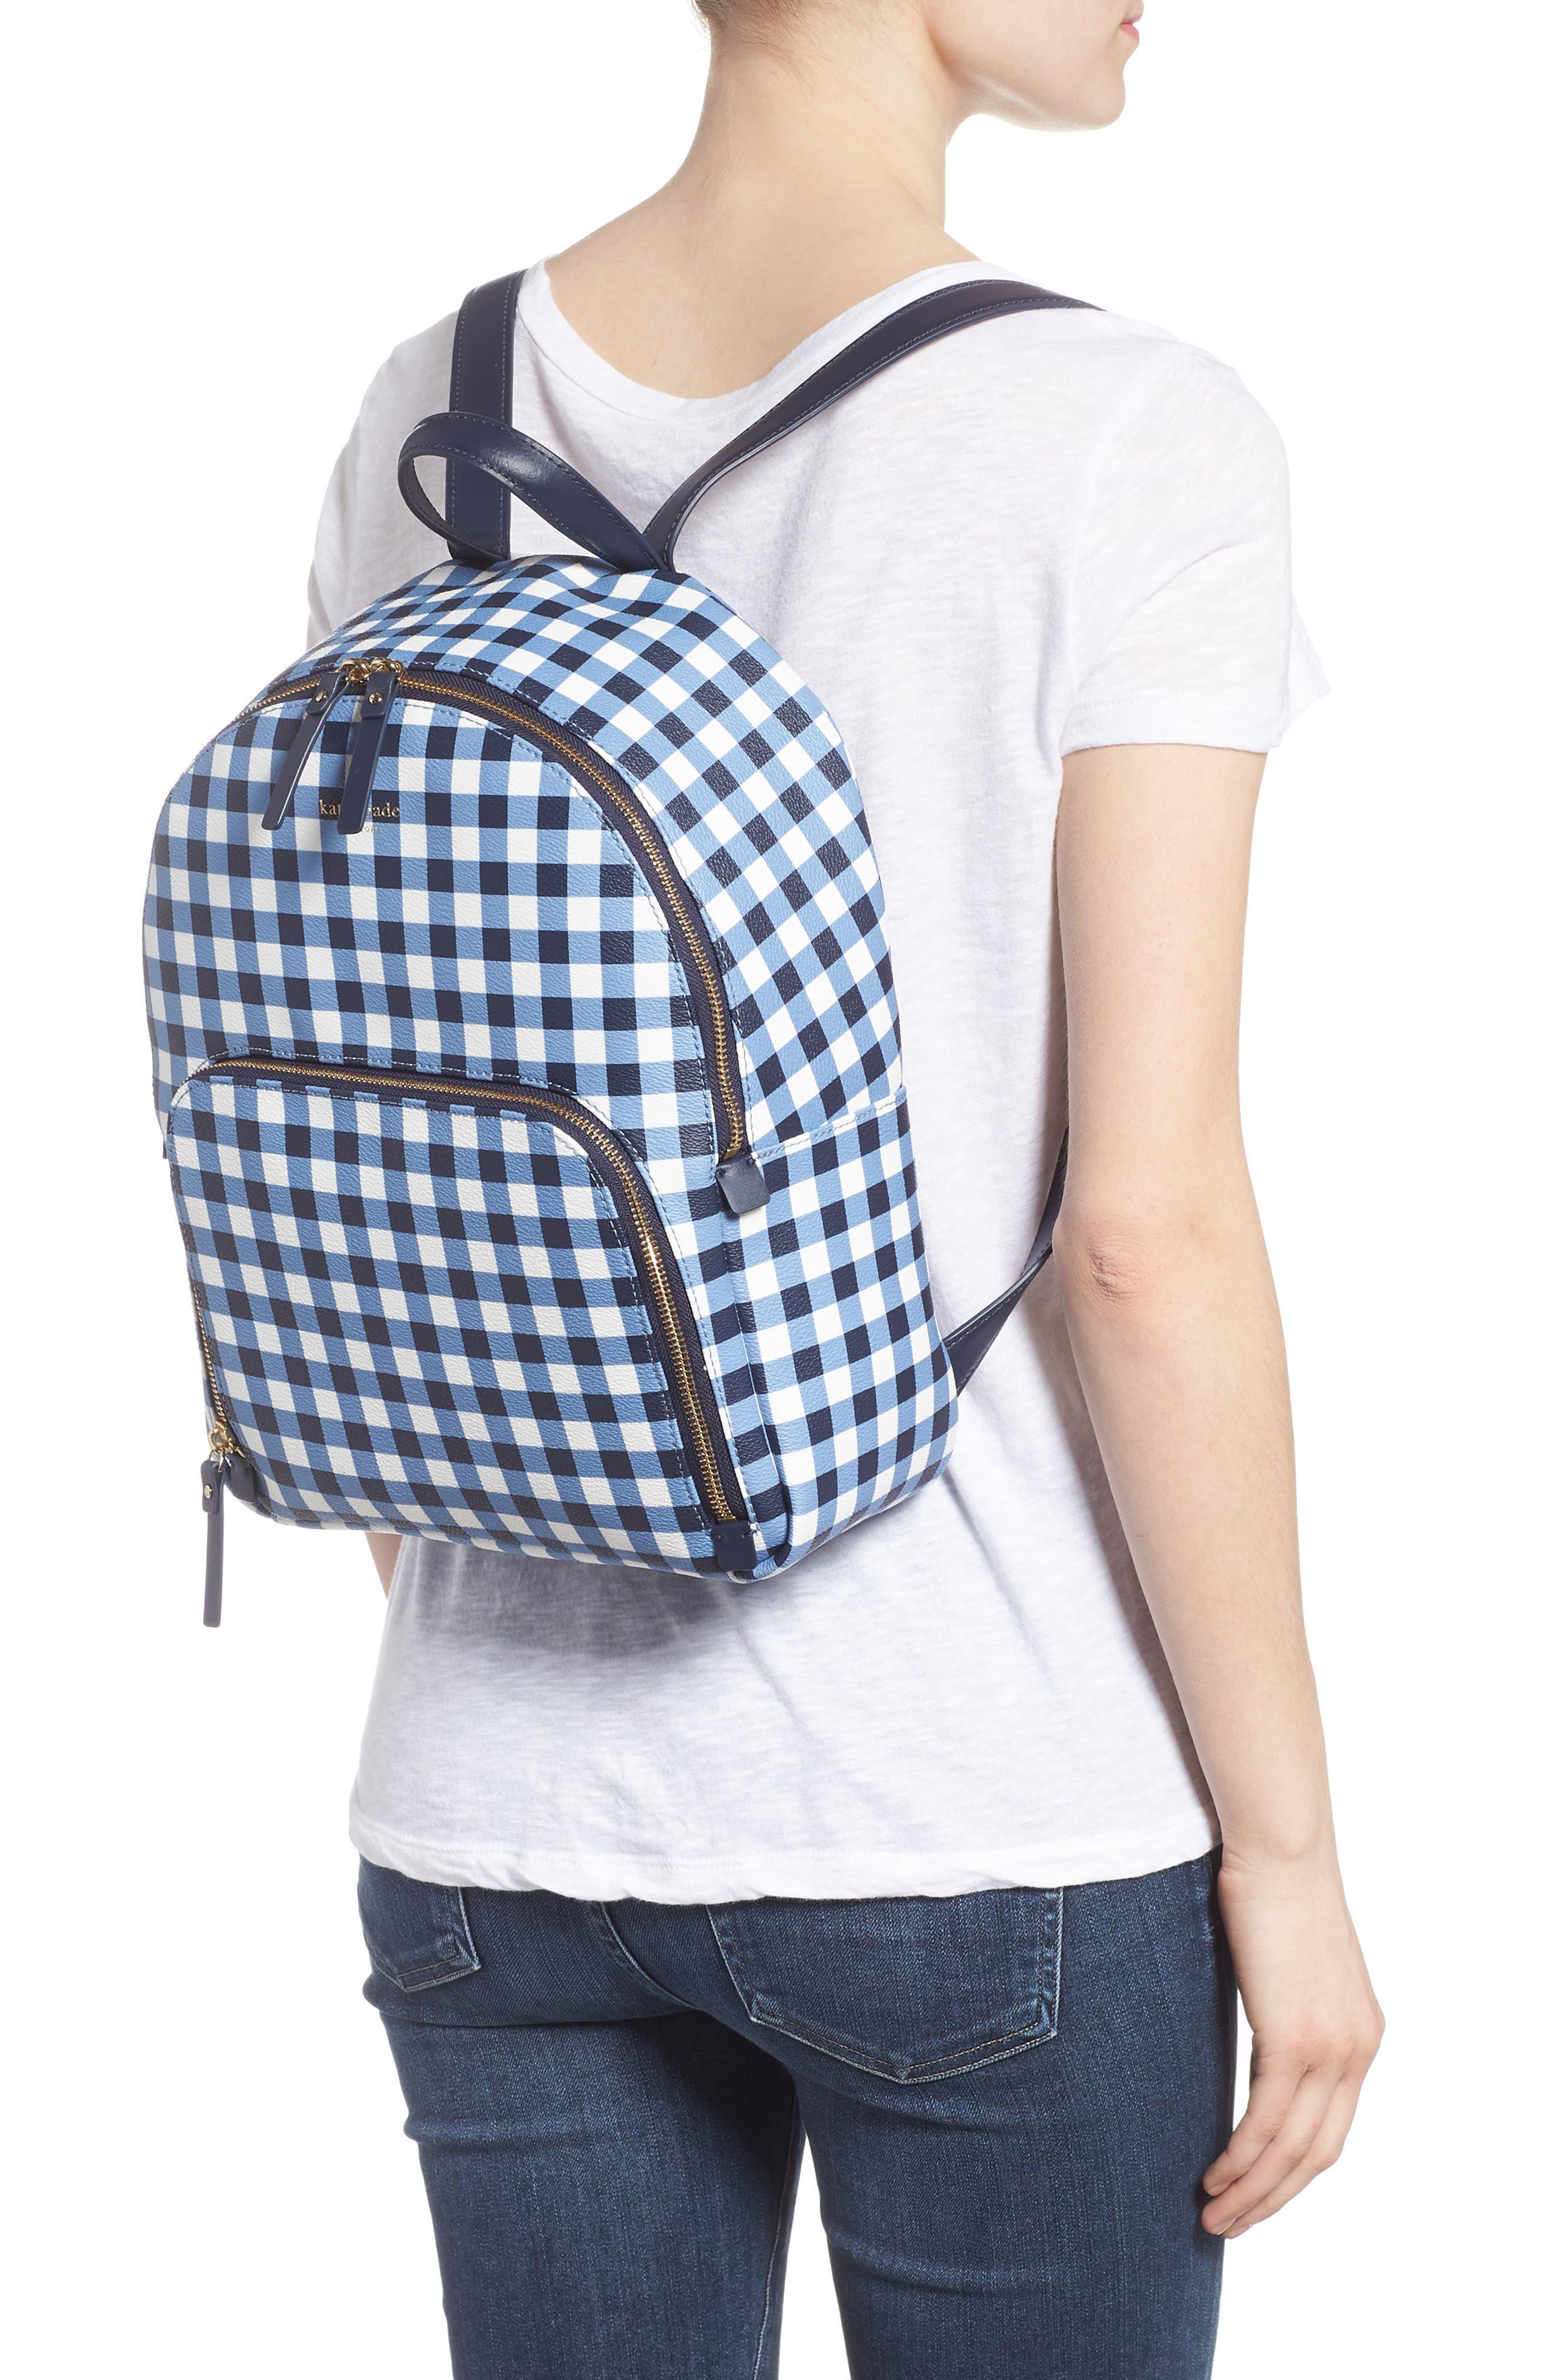 hyde lane hartley gingham backpack,                             Alternate thumbnail 2, color,                             400